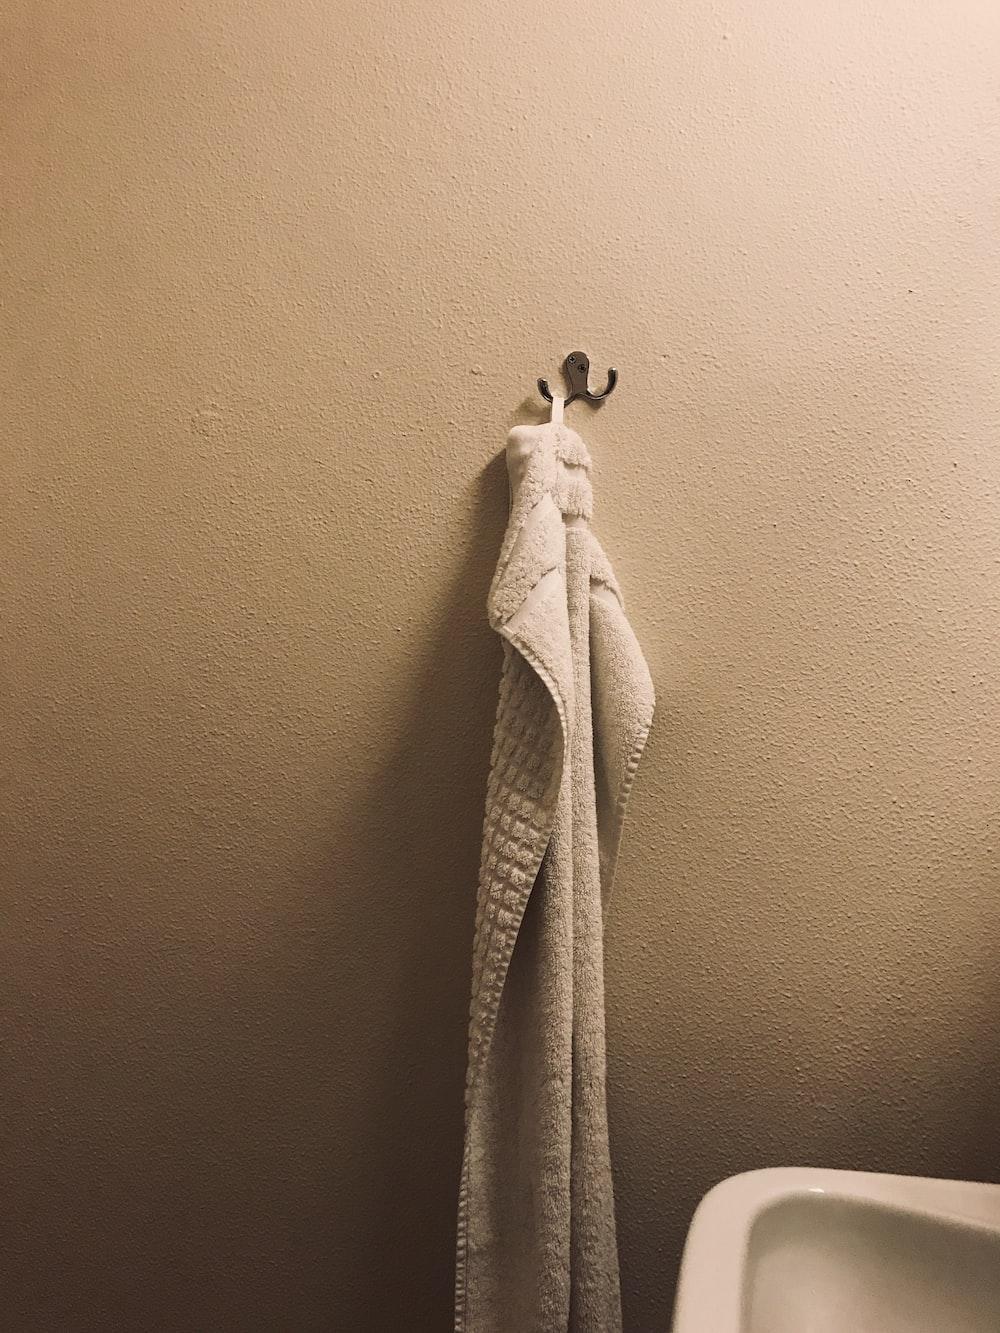 hung white towel